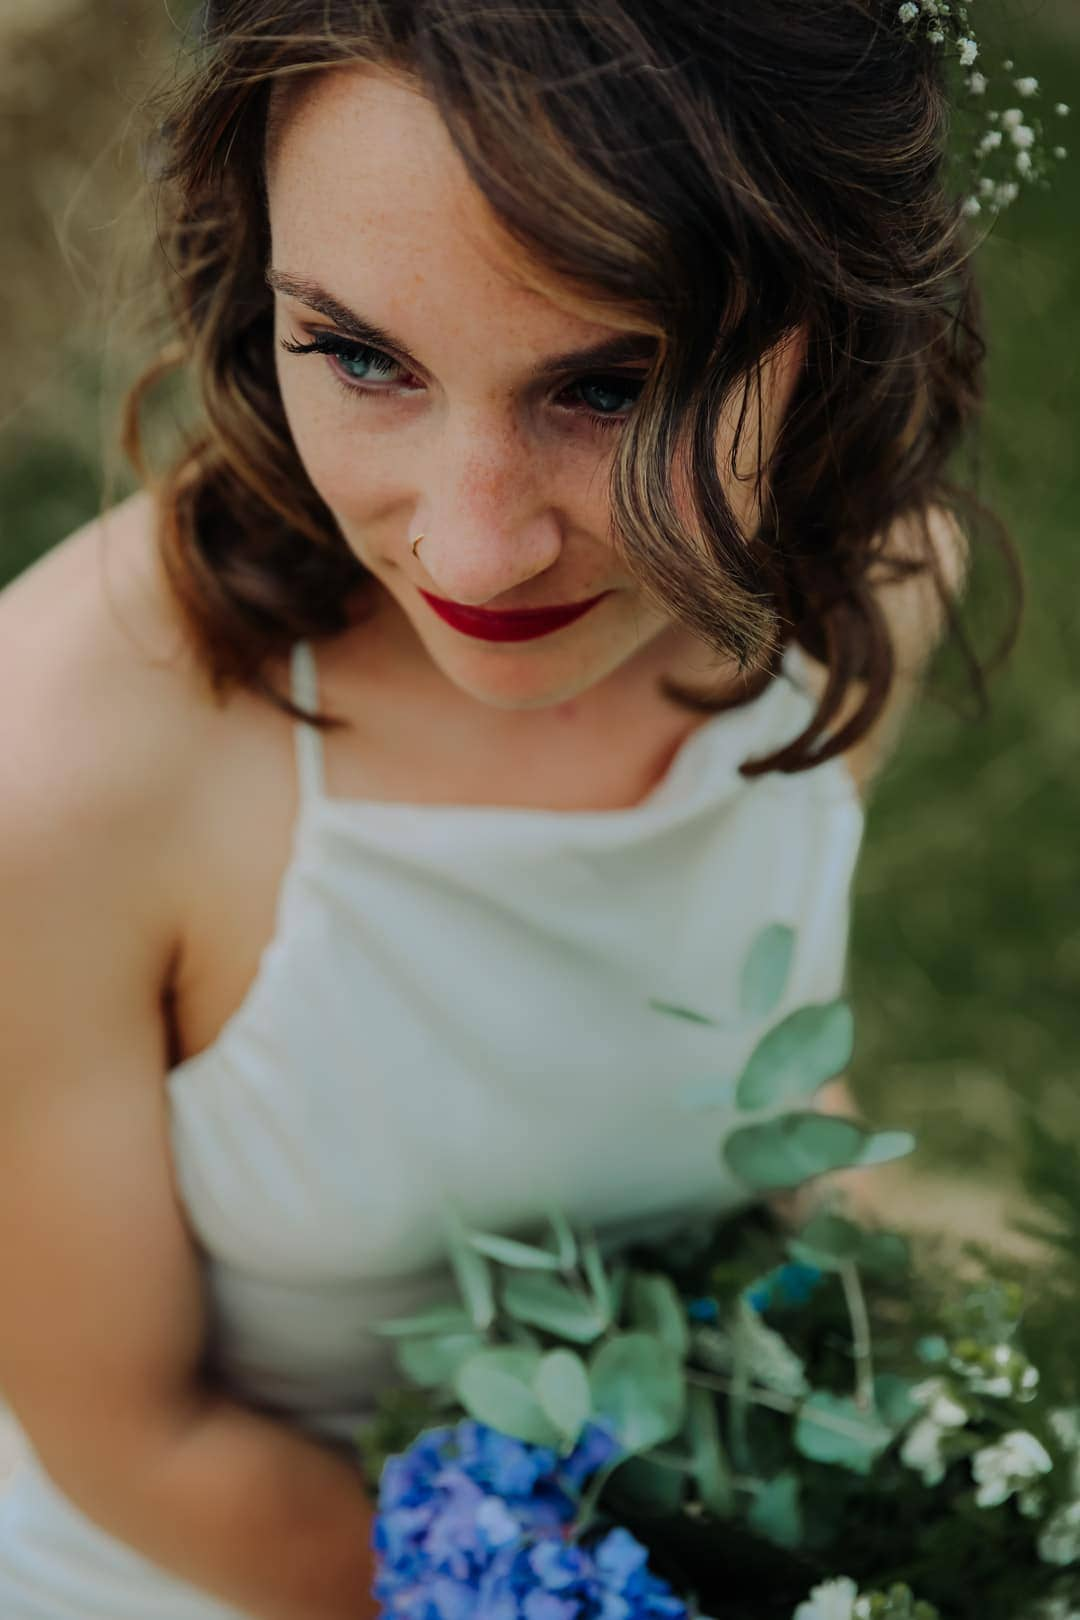 alternative-bride-close-up-portrait